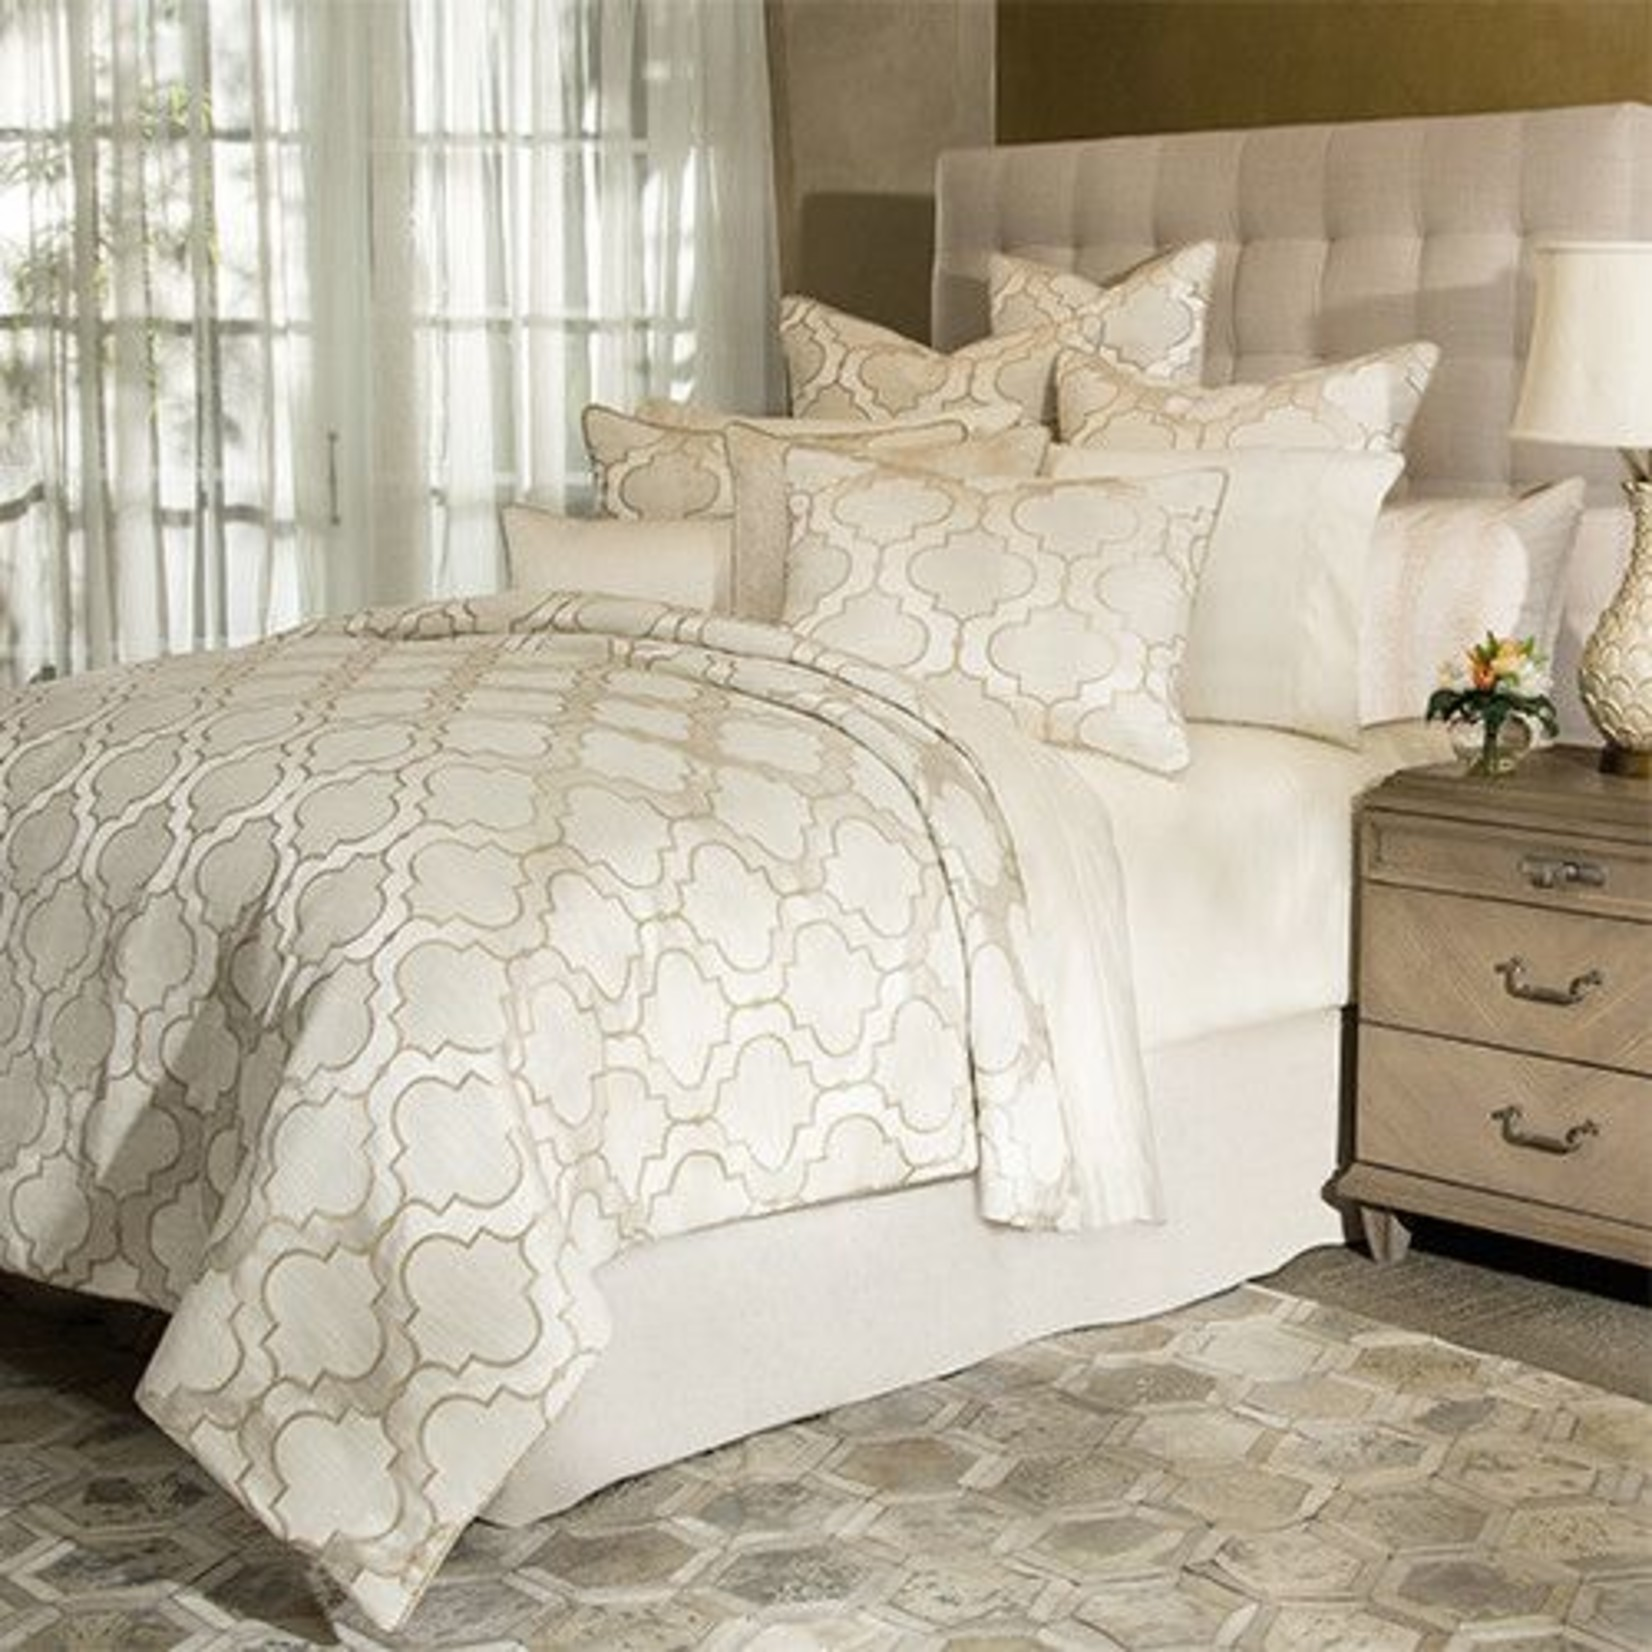 Spectrum 10 pc King Comforter Set